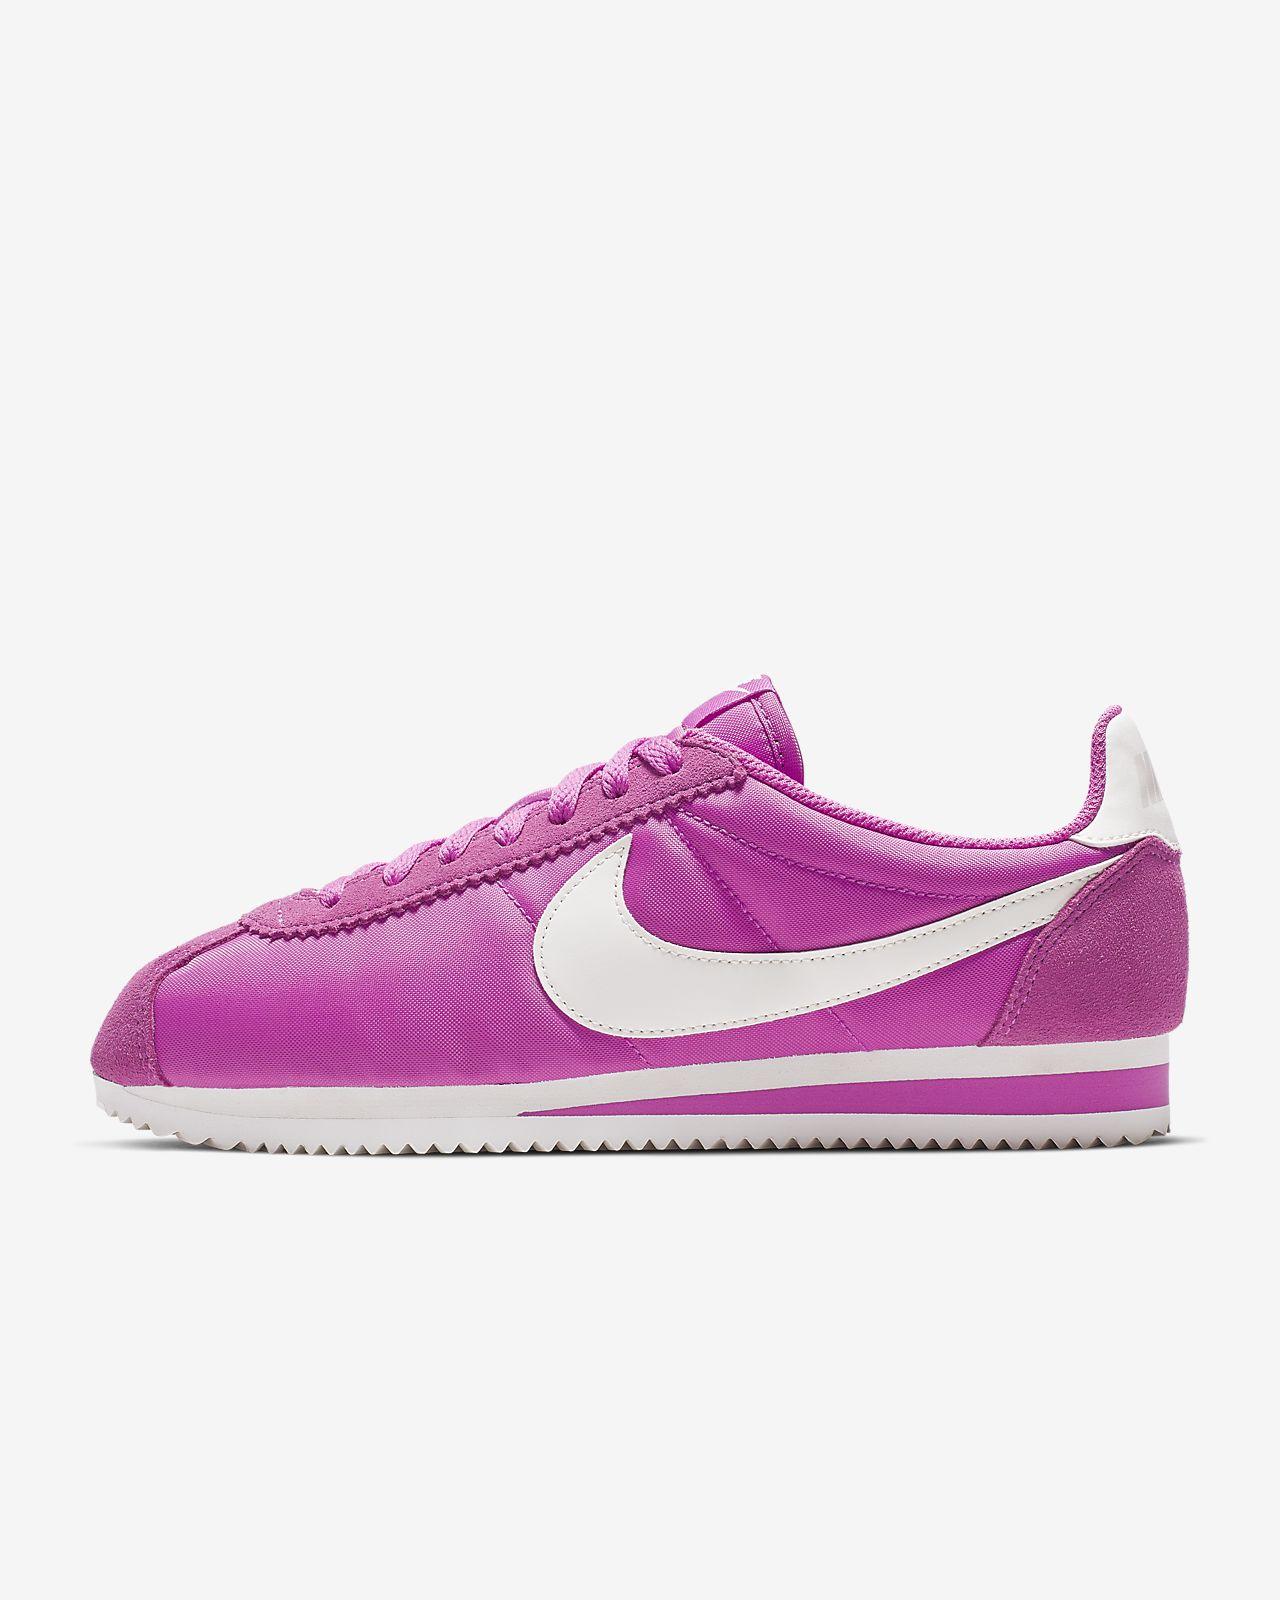 b2010f38b6d Sapatilhas Nike Classic Cortez Nylon para mulher. Nike.com PT